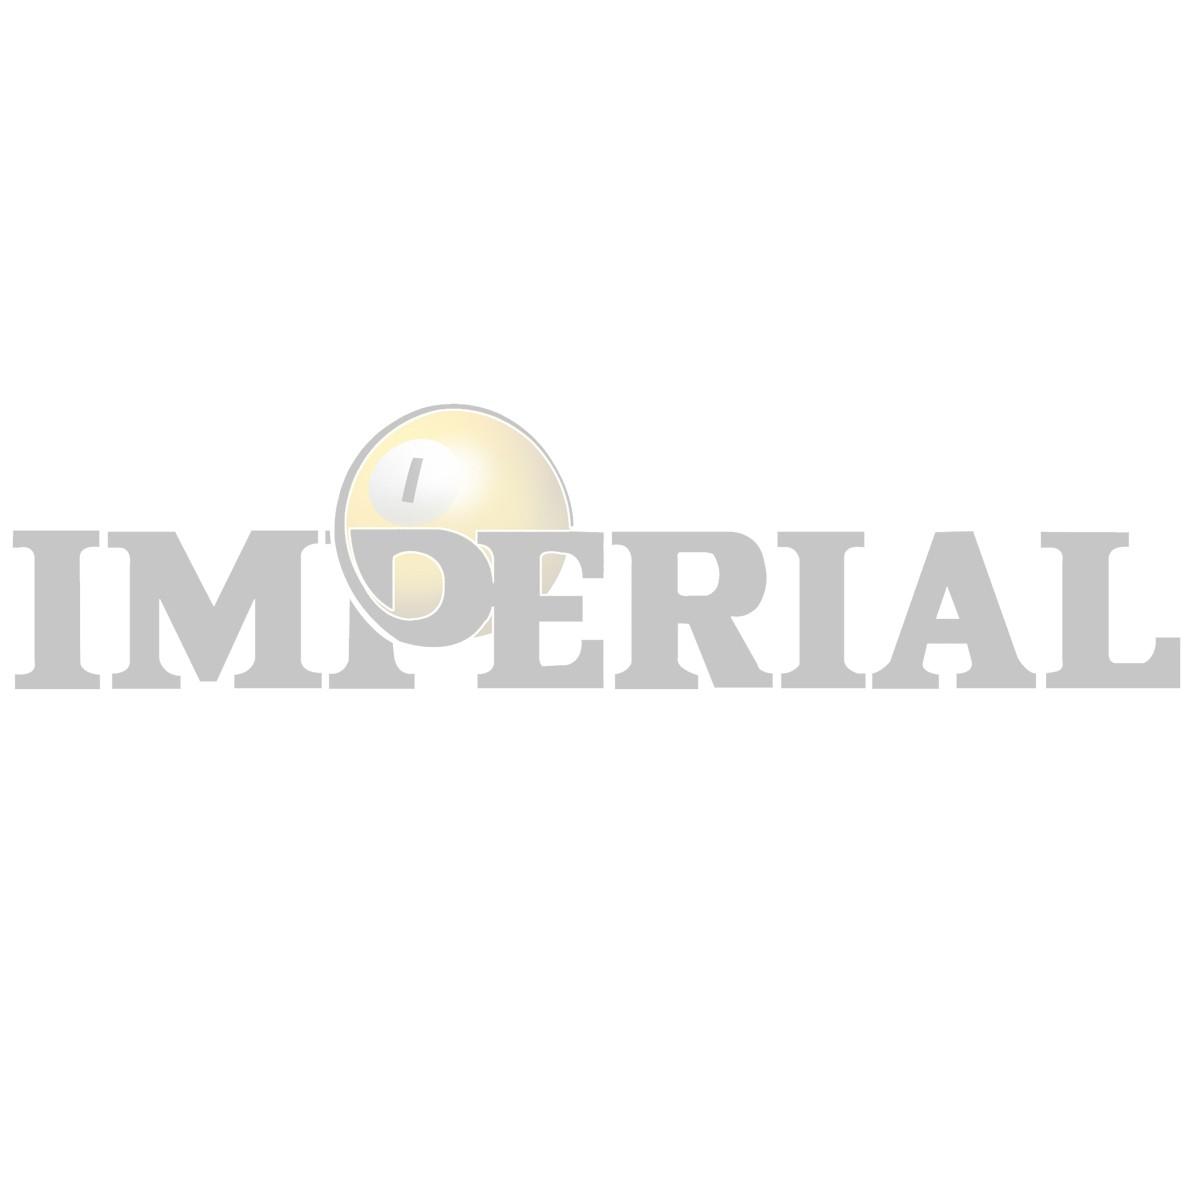 Arizona Cardinals 9-foot Billiard Cloth